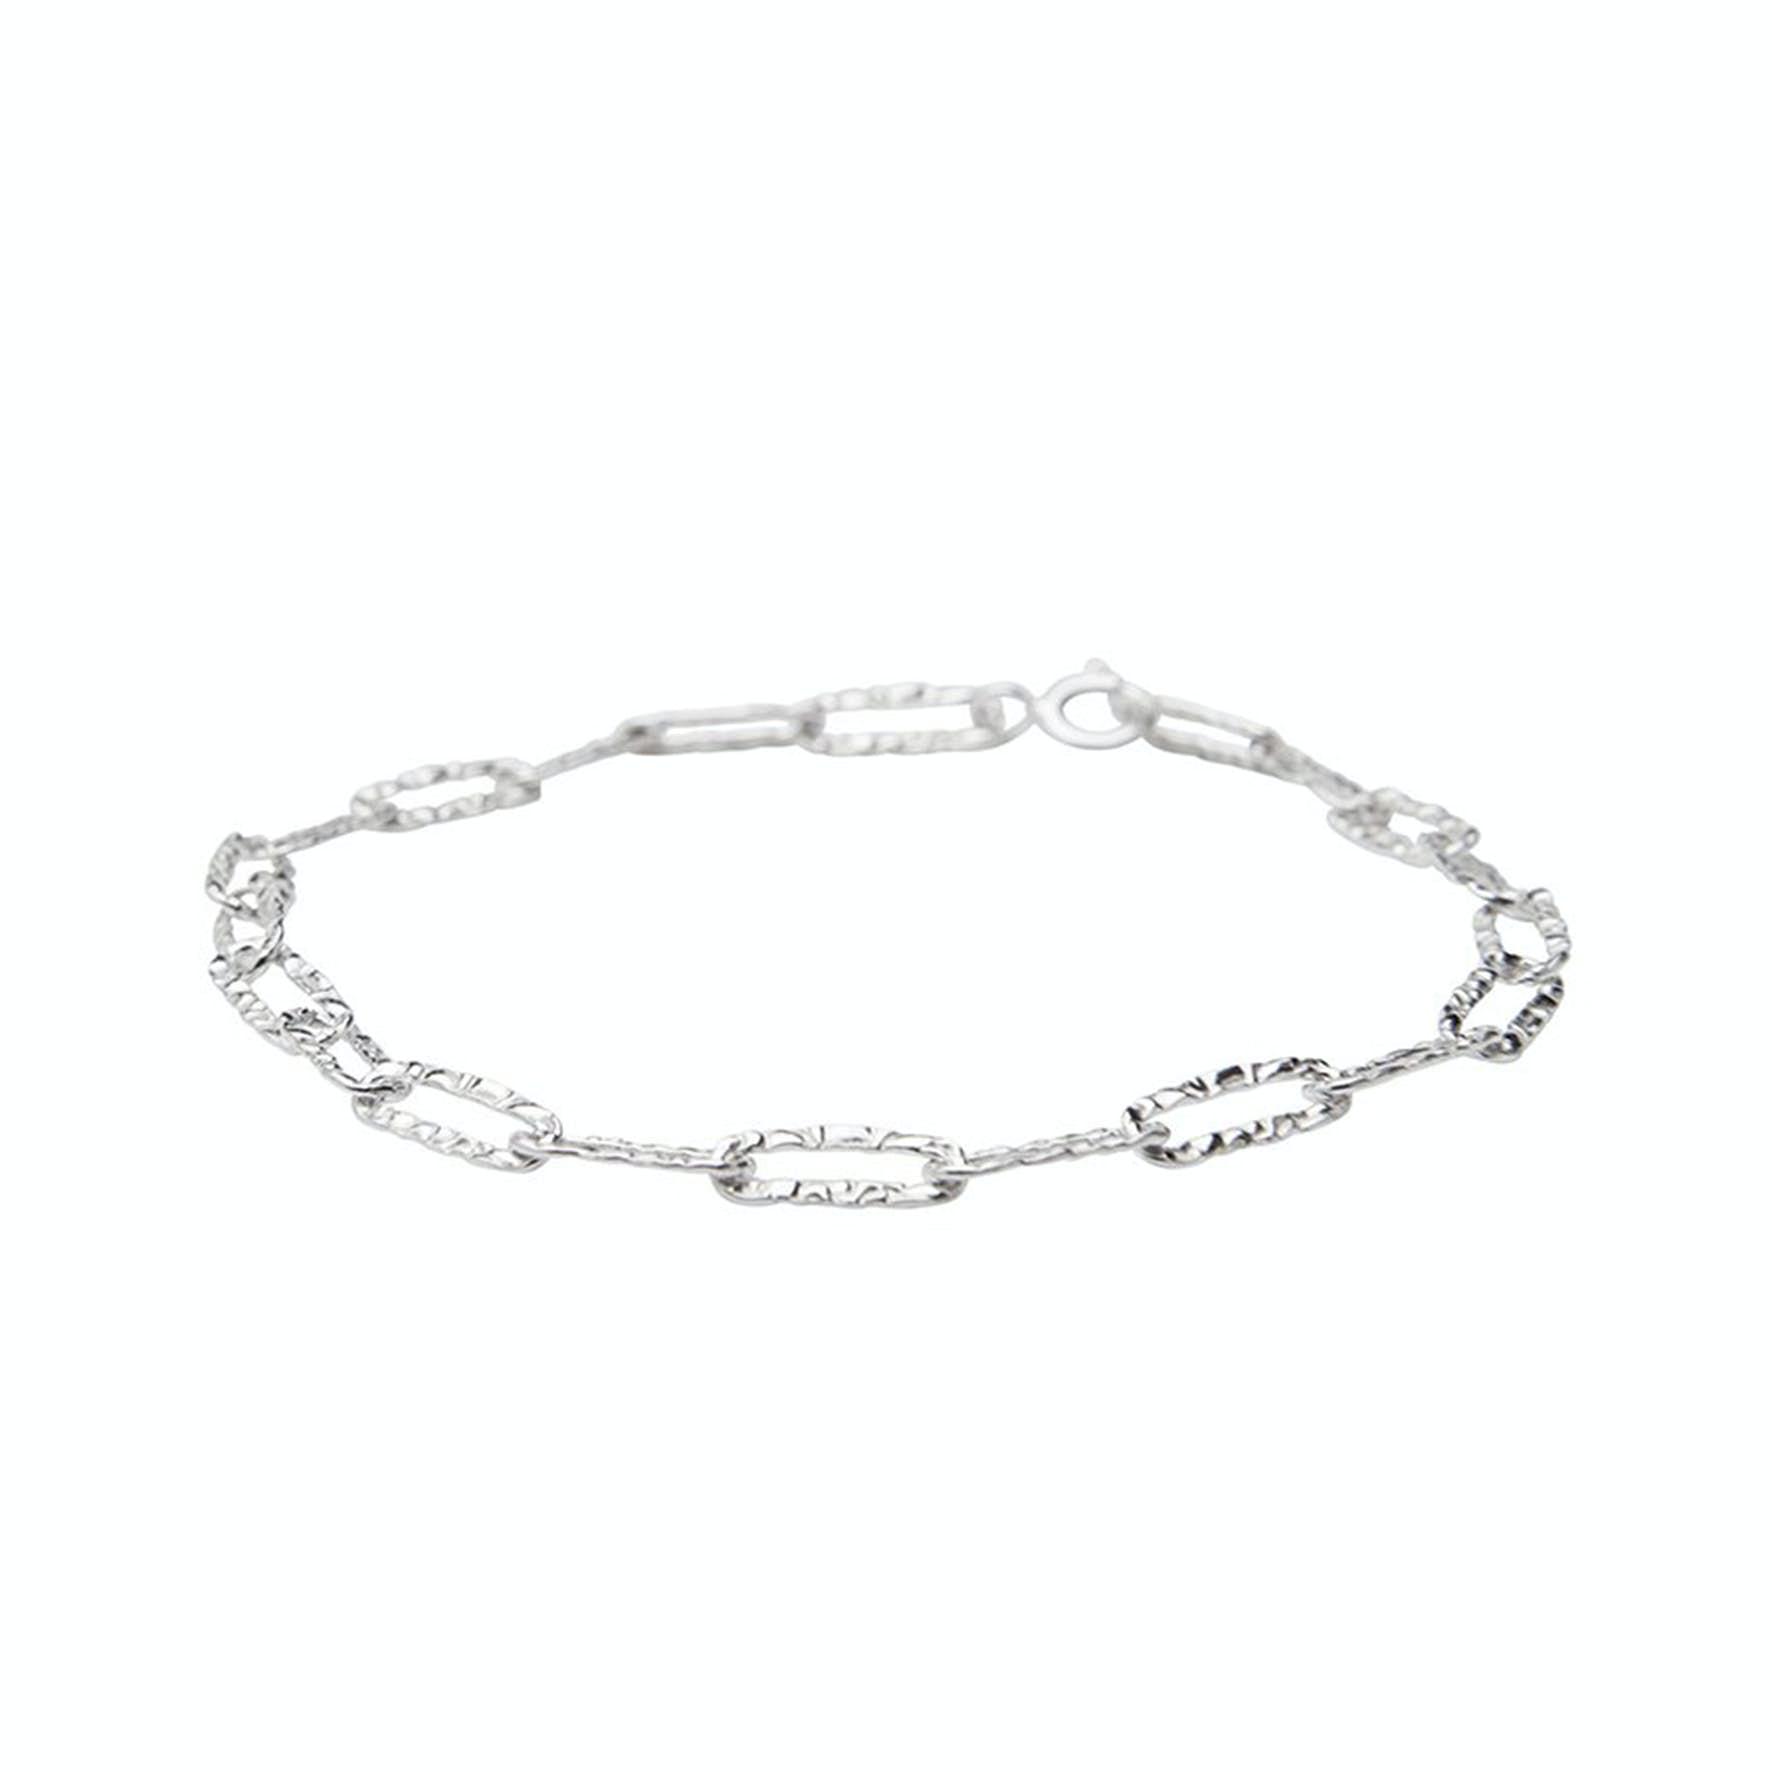 Ginny Bracelet fra Pico i Sølv Sterling 925